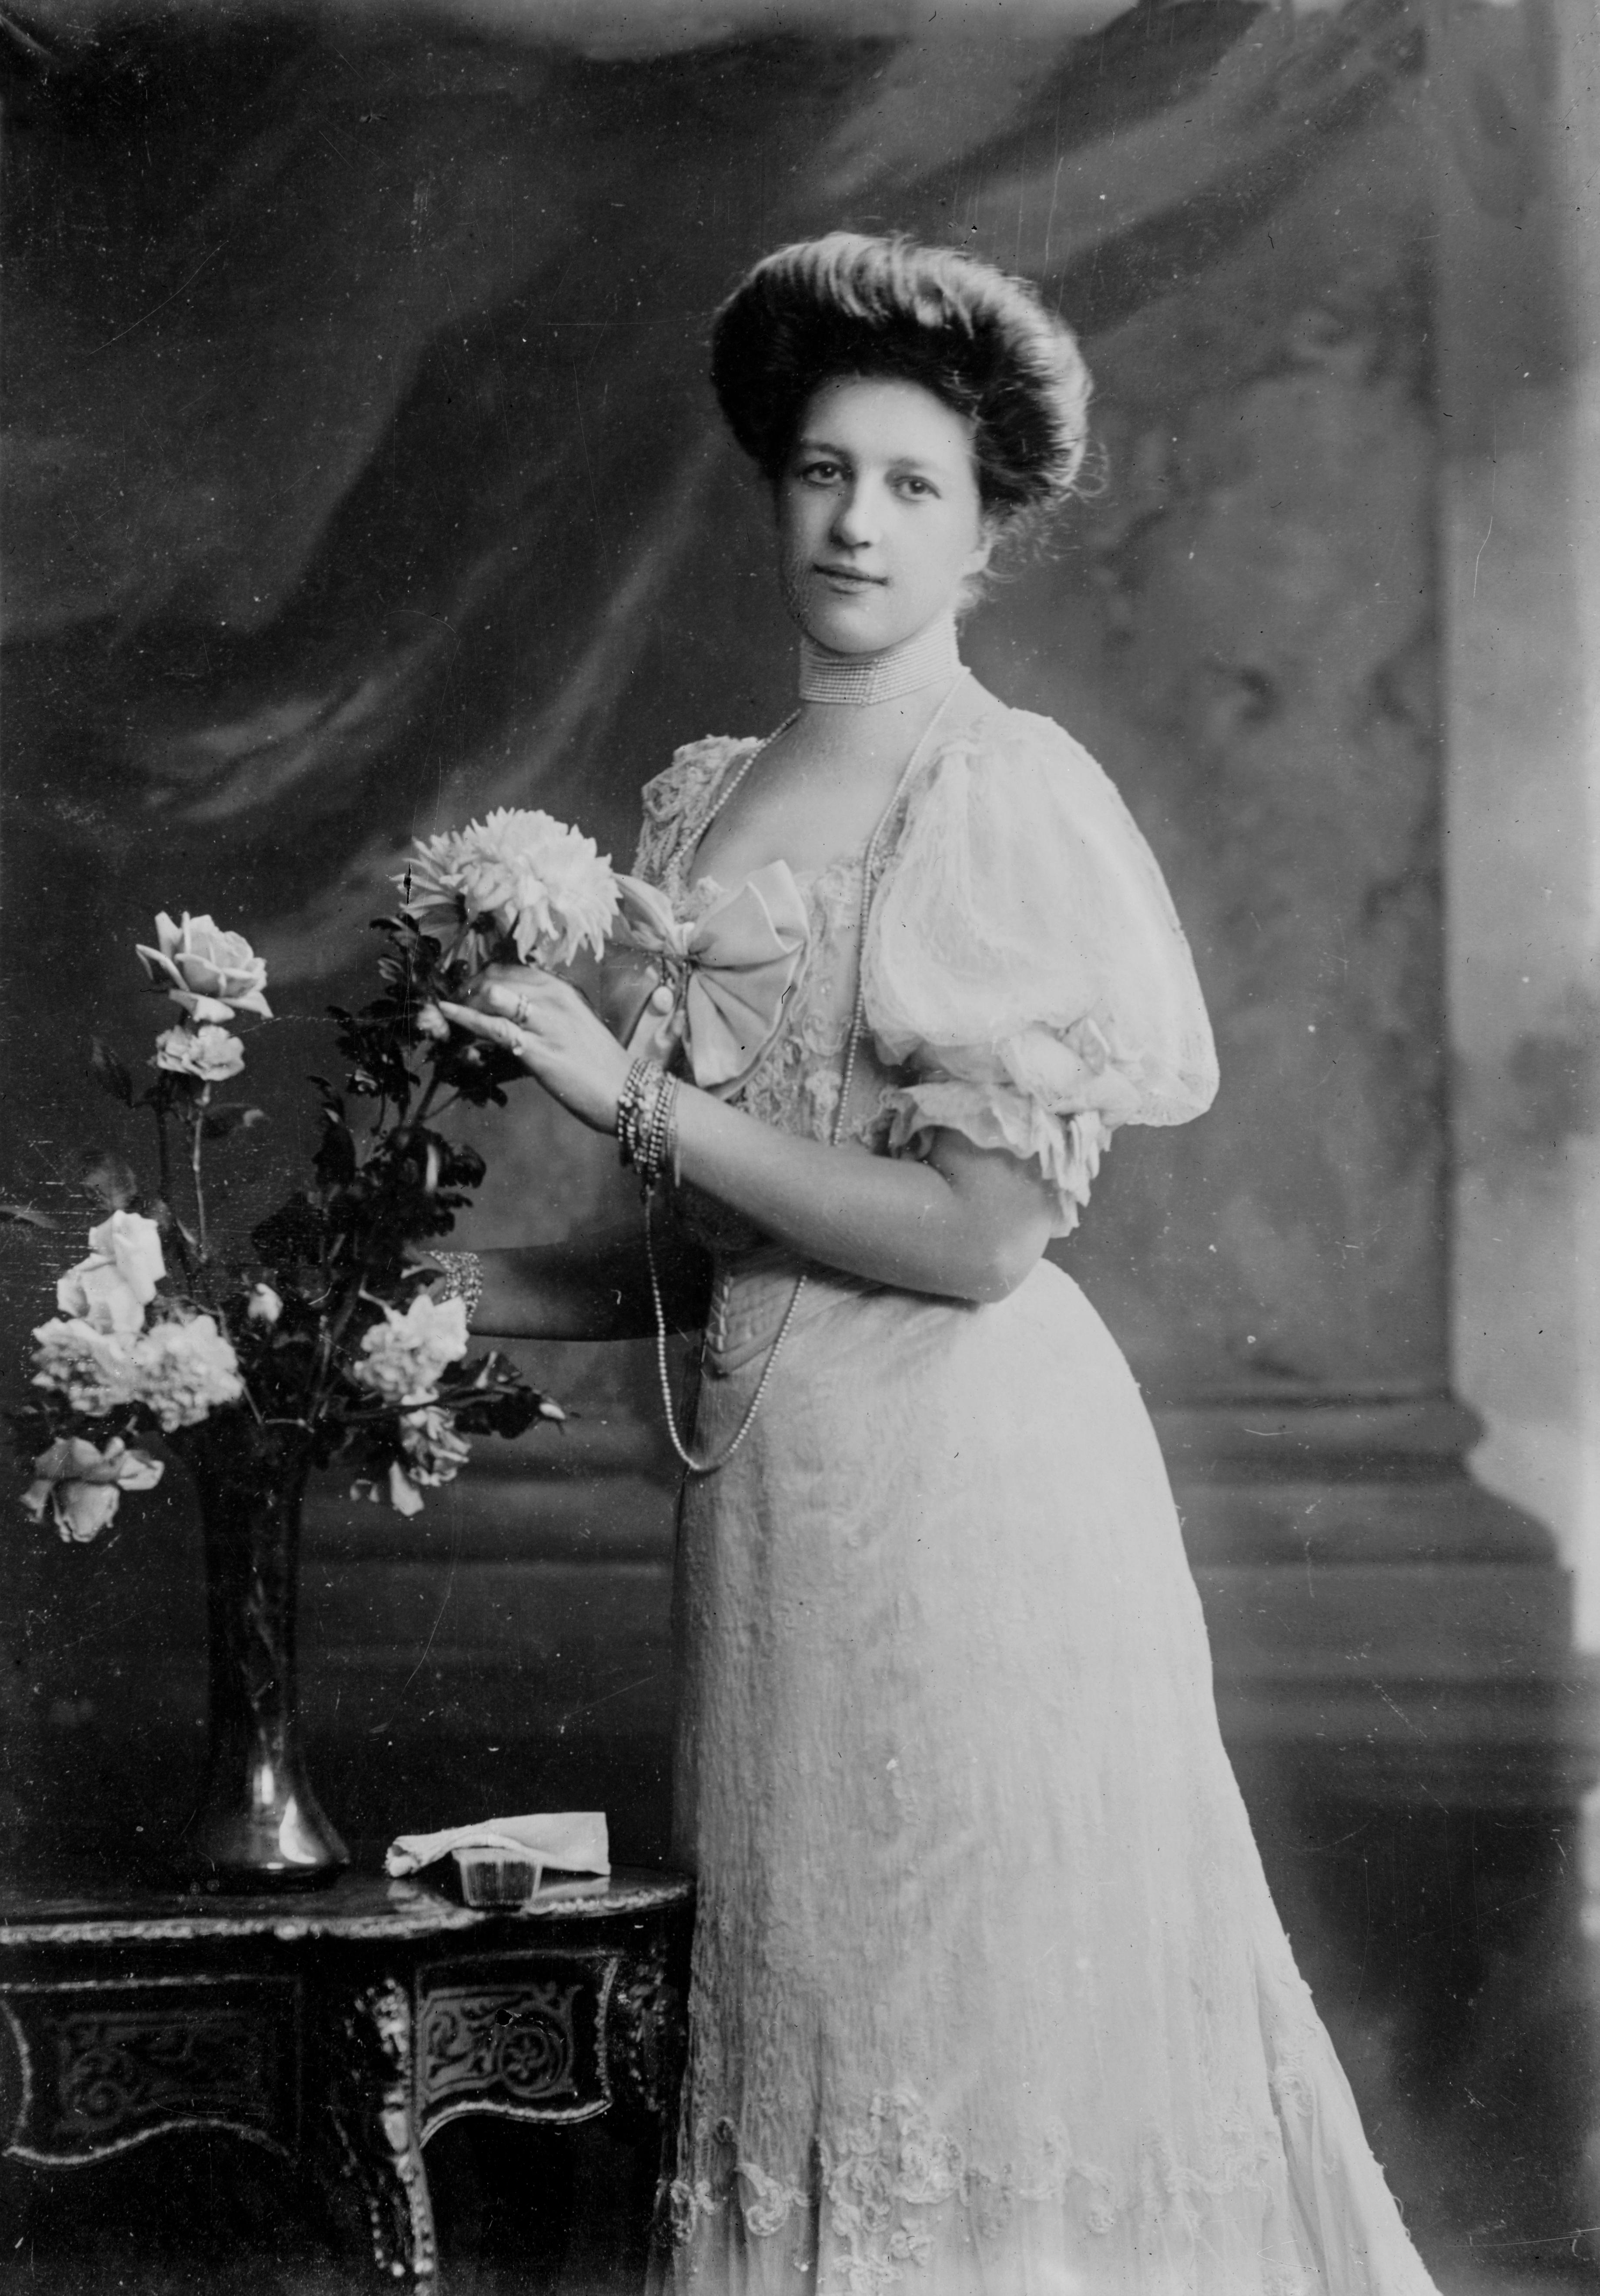 Princess Dorothea of Saxe-Coburg and Gotha